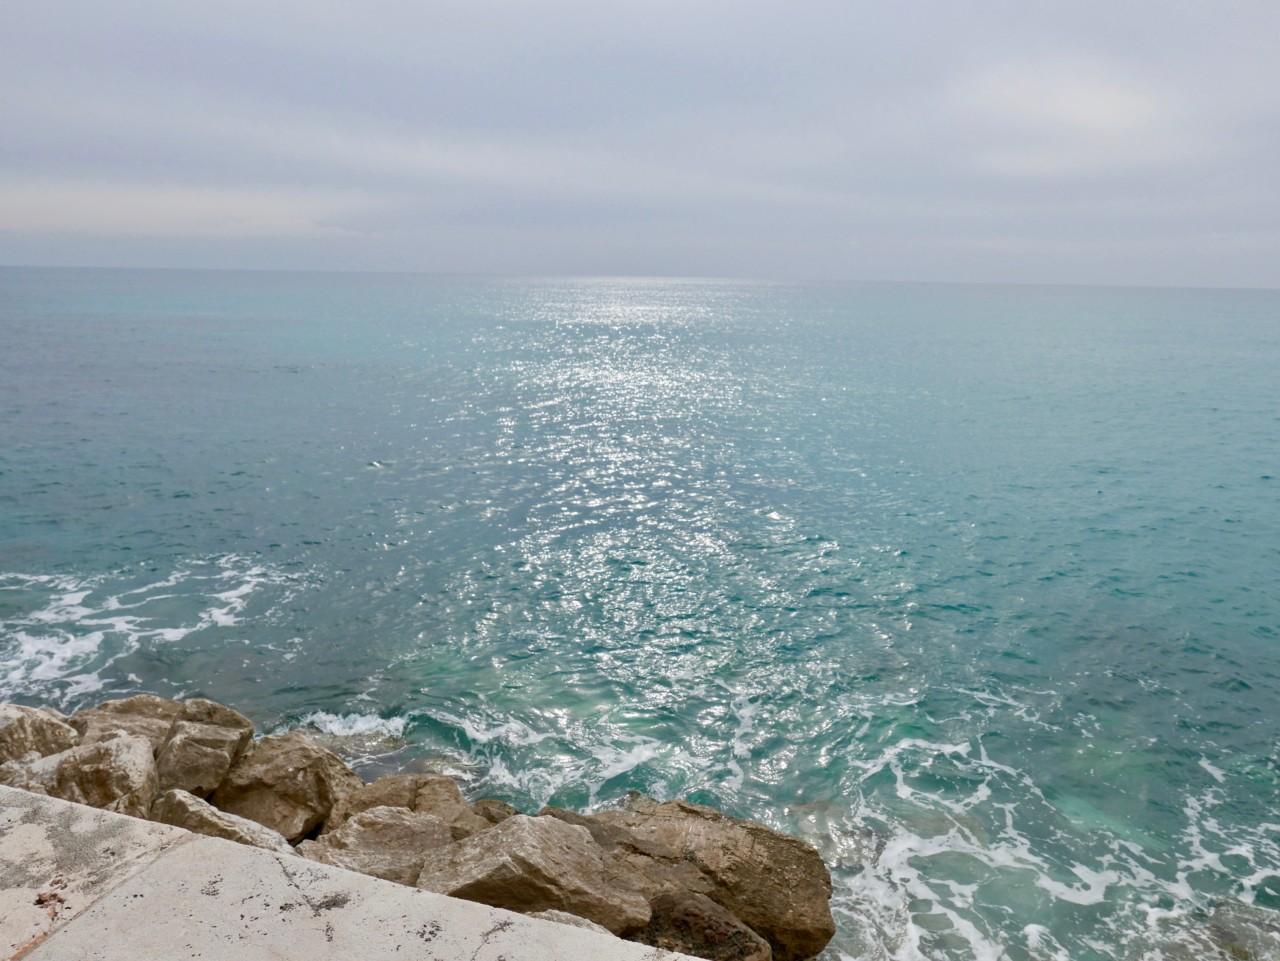 middelhavet-cote-azur-rivieraen-menton-green-house